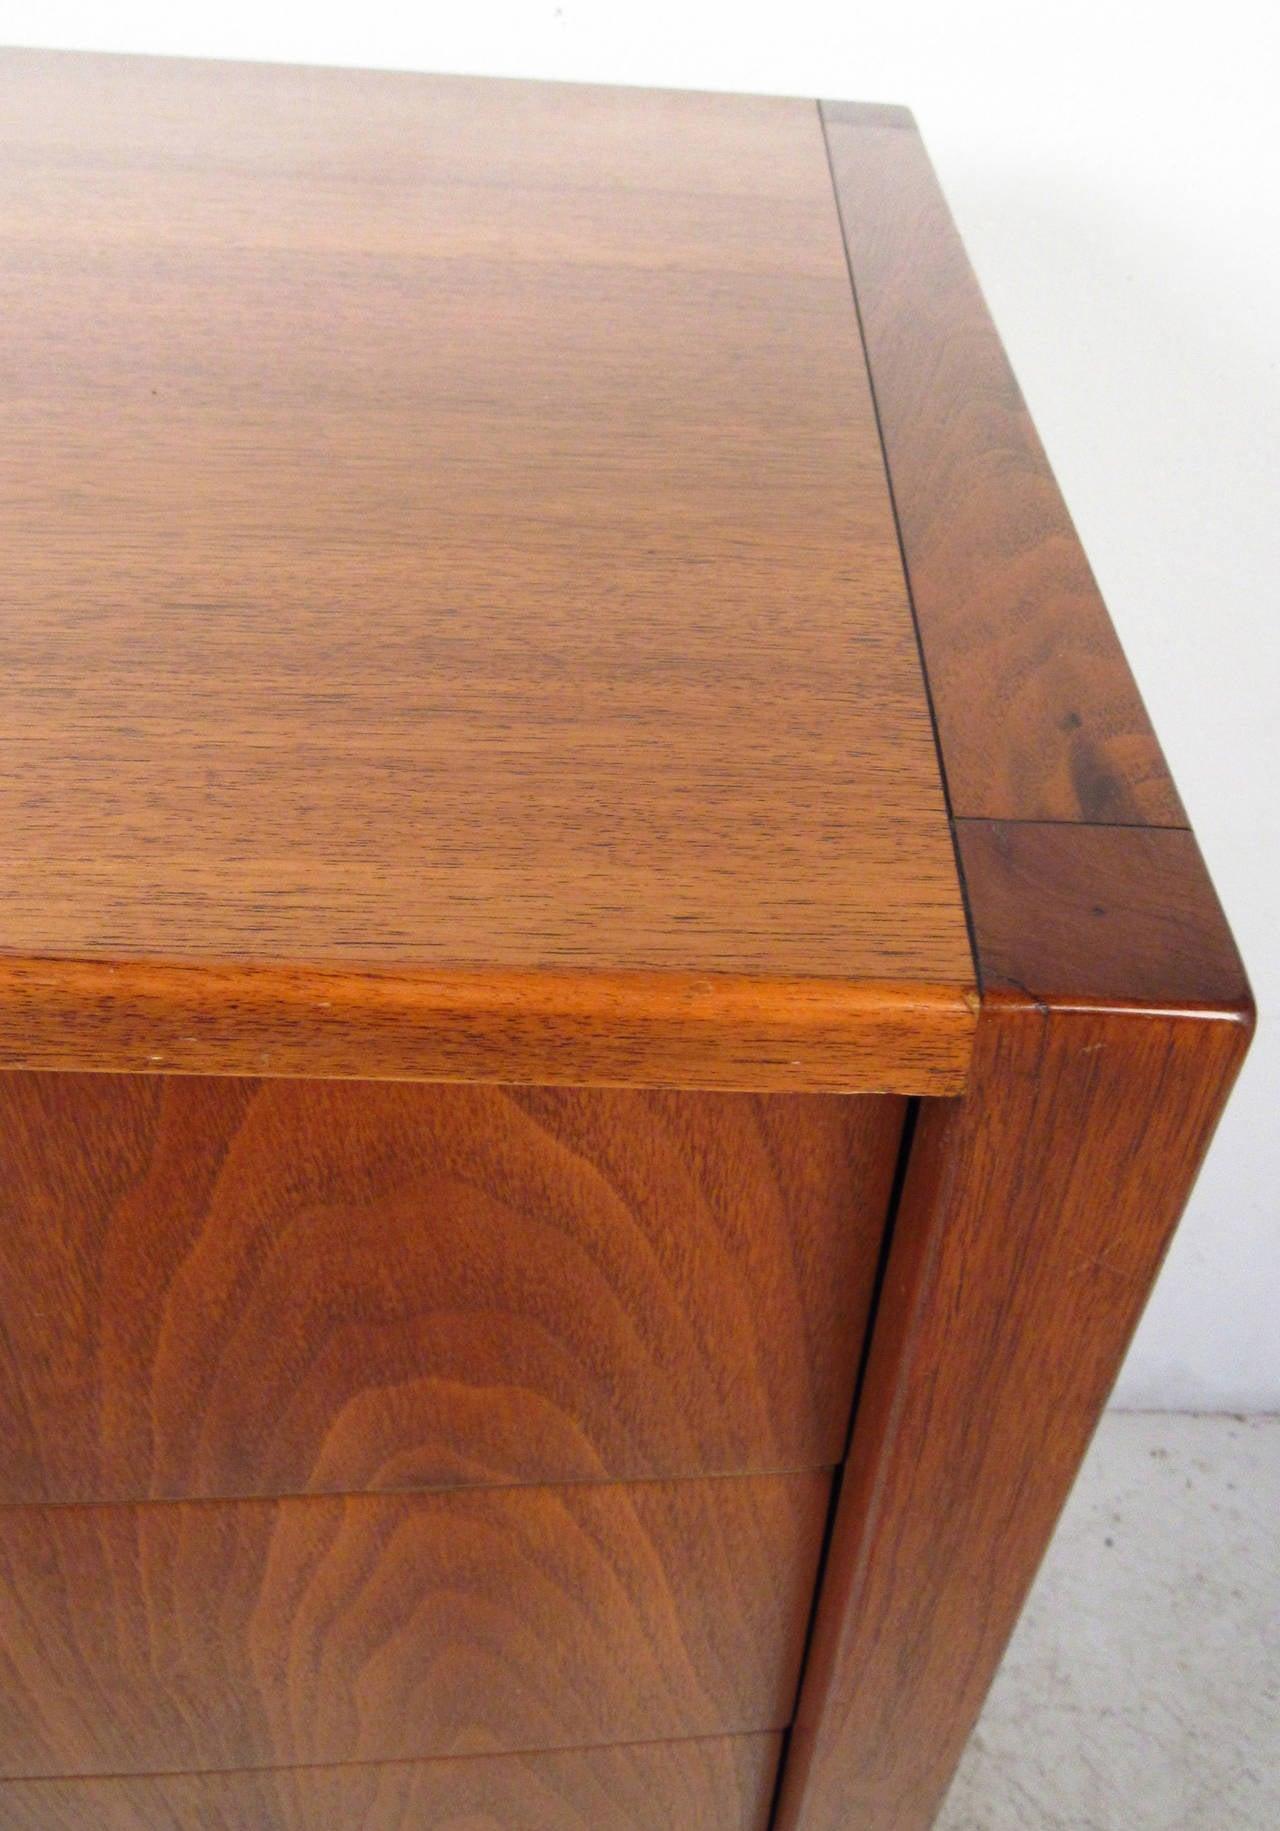 sligh furniture office room. Mid-20th Century Vintage American Walnut Dresser With Chrome Accenting By Sligh Furniture For Sale Office Room R